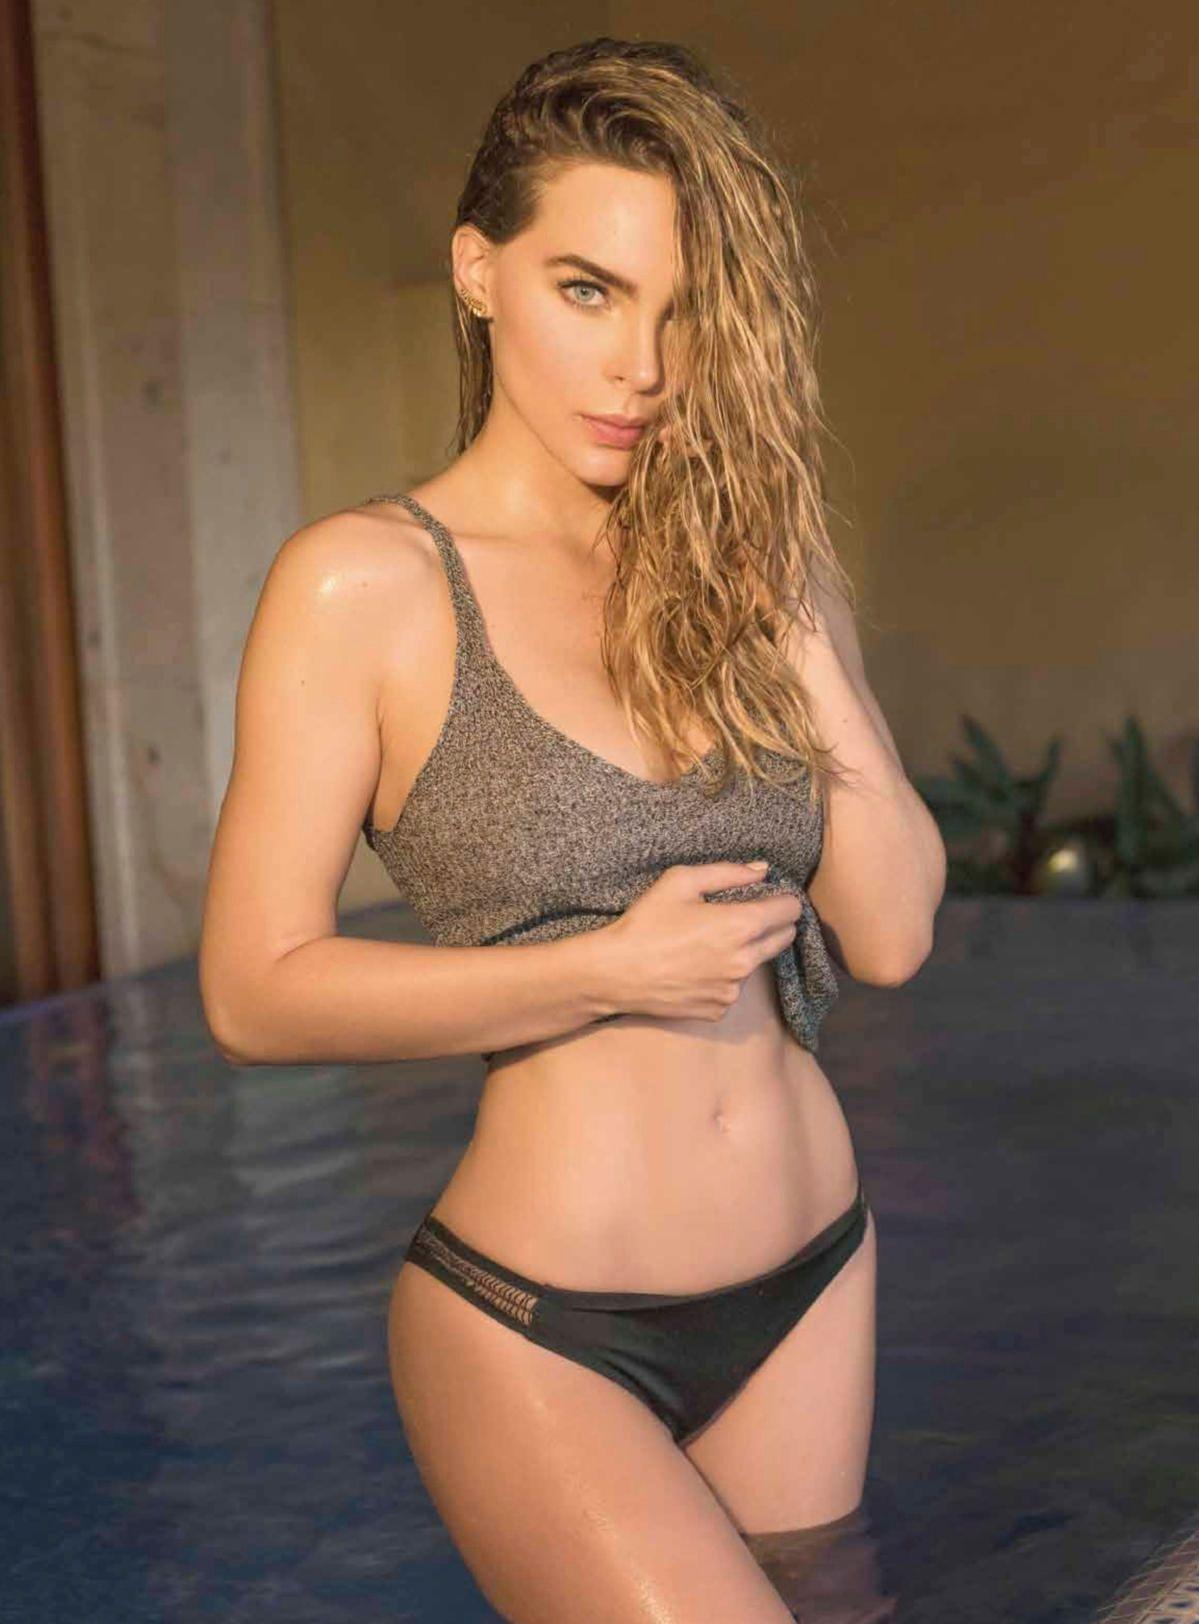 Belinda-Peregrin-Sexy-4